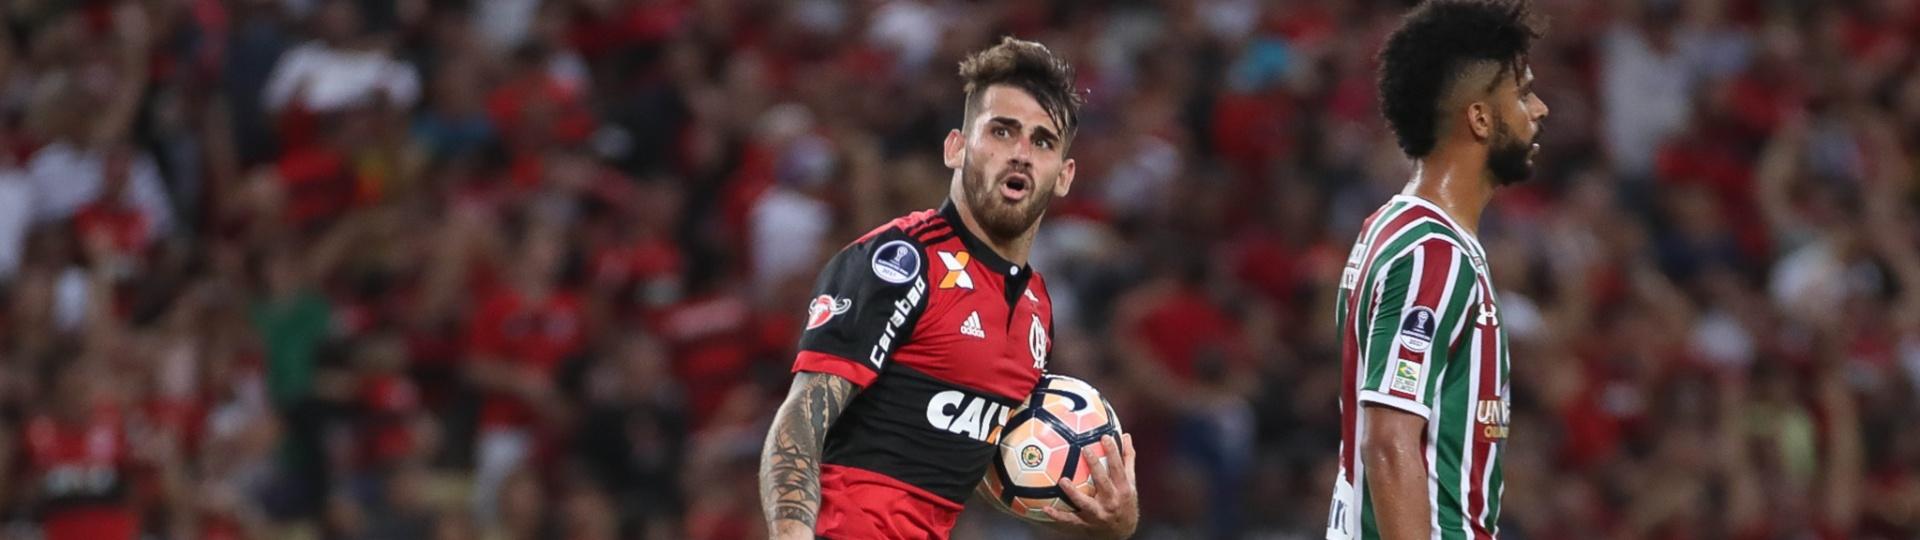 Felipe Vizeu comemora gol do Flamengo sobre o Fluminense